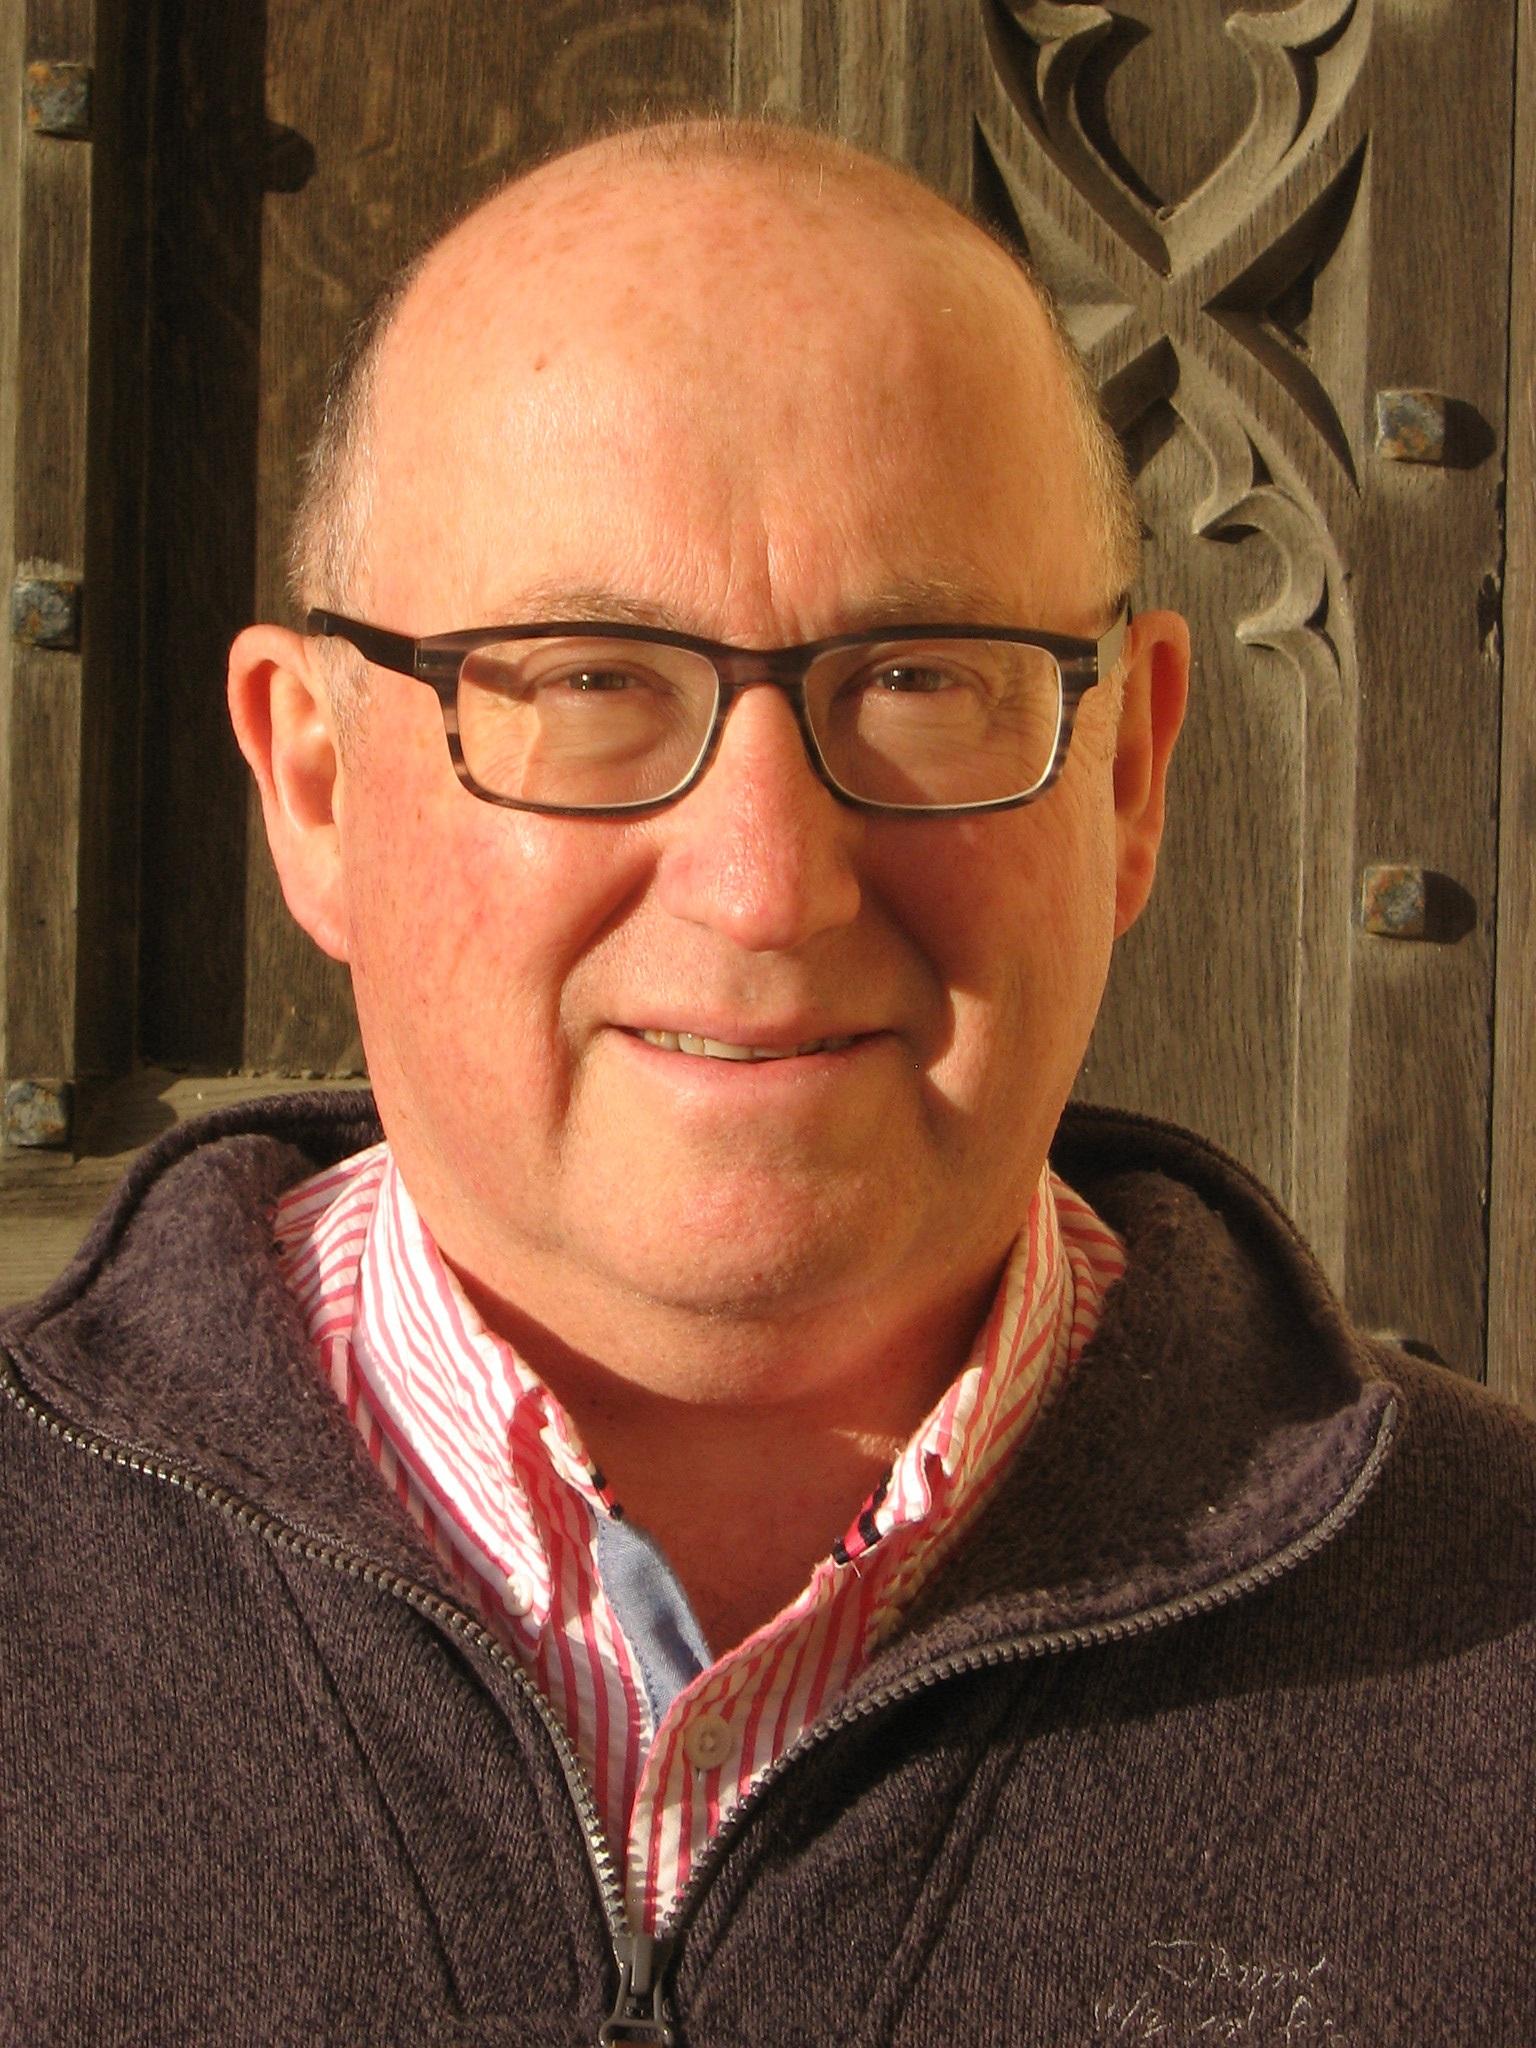 Press Release: Mark Collard Joins Rubicon Heritage